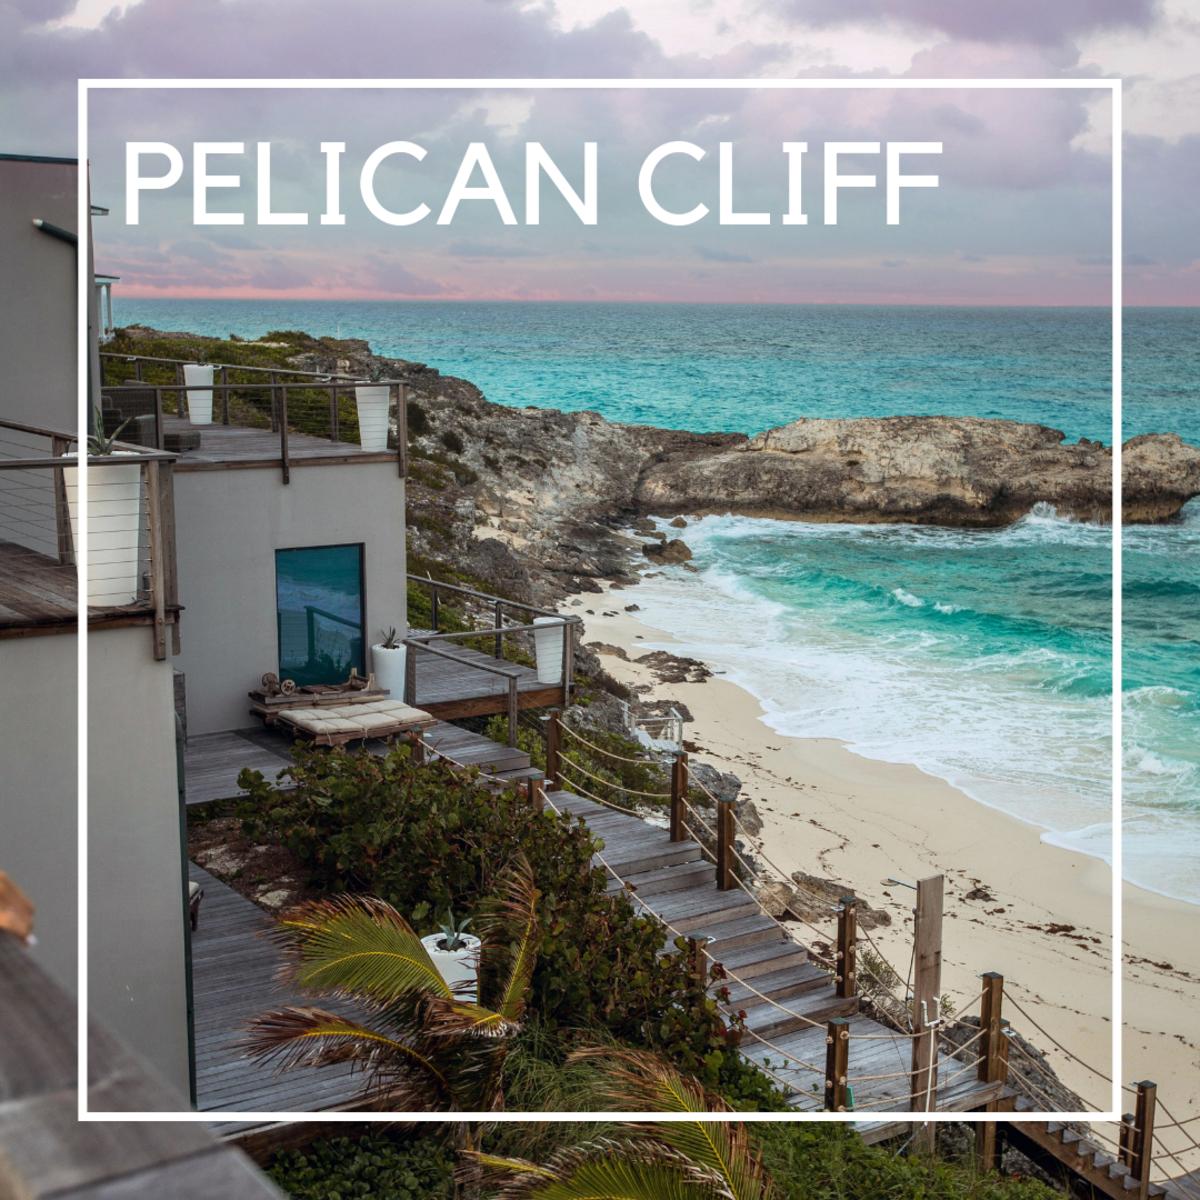 Pelican Cliff